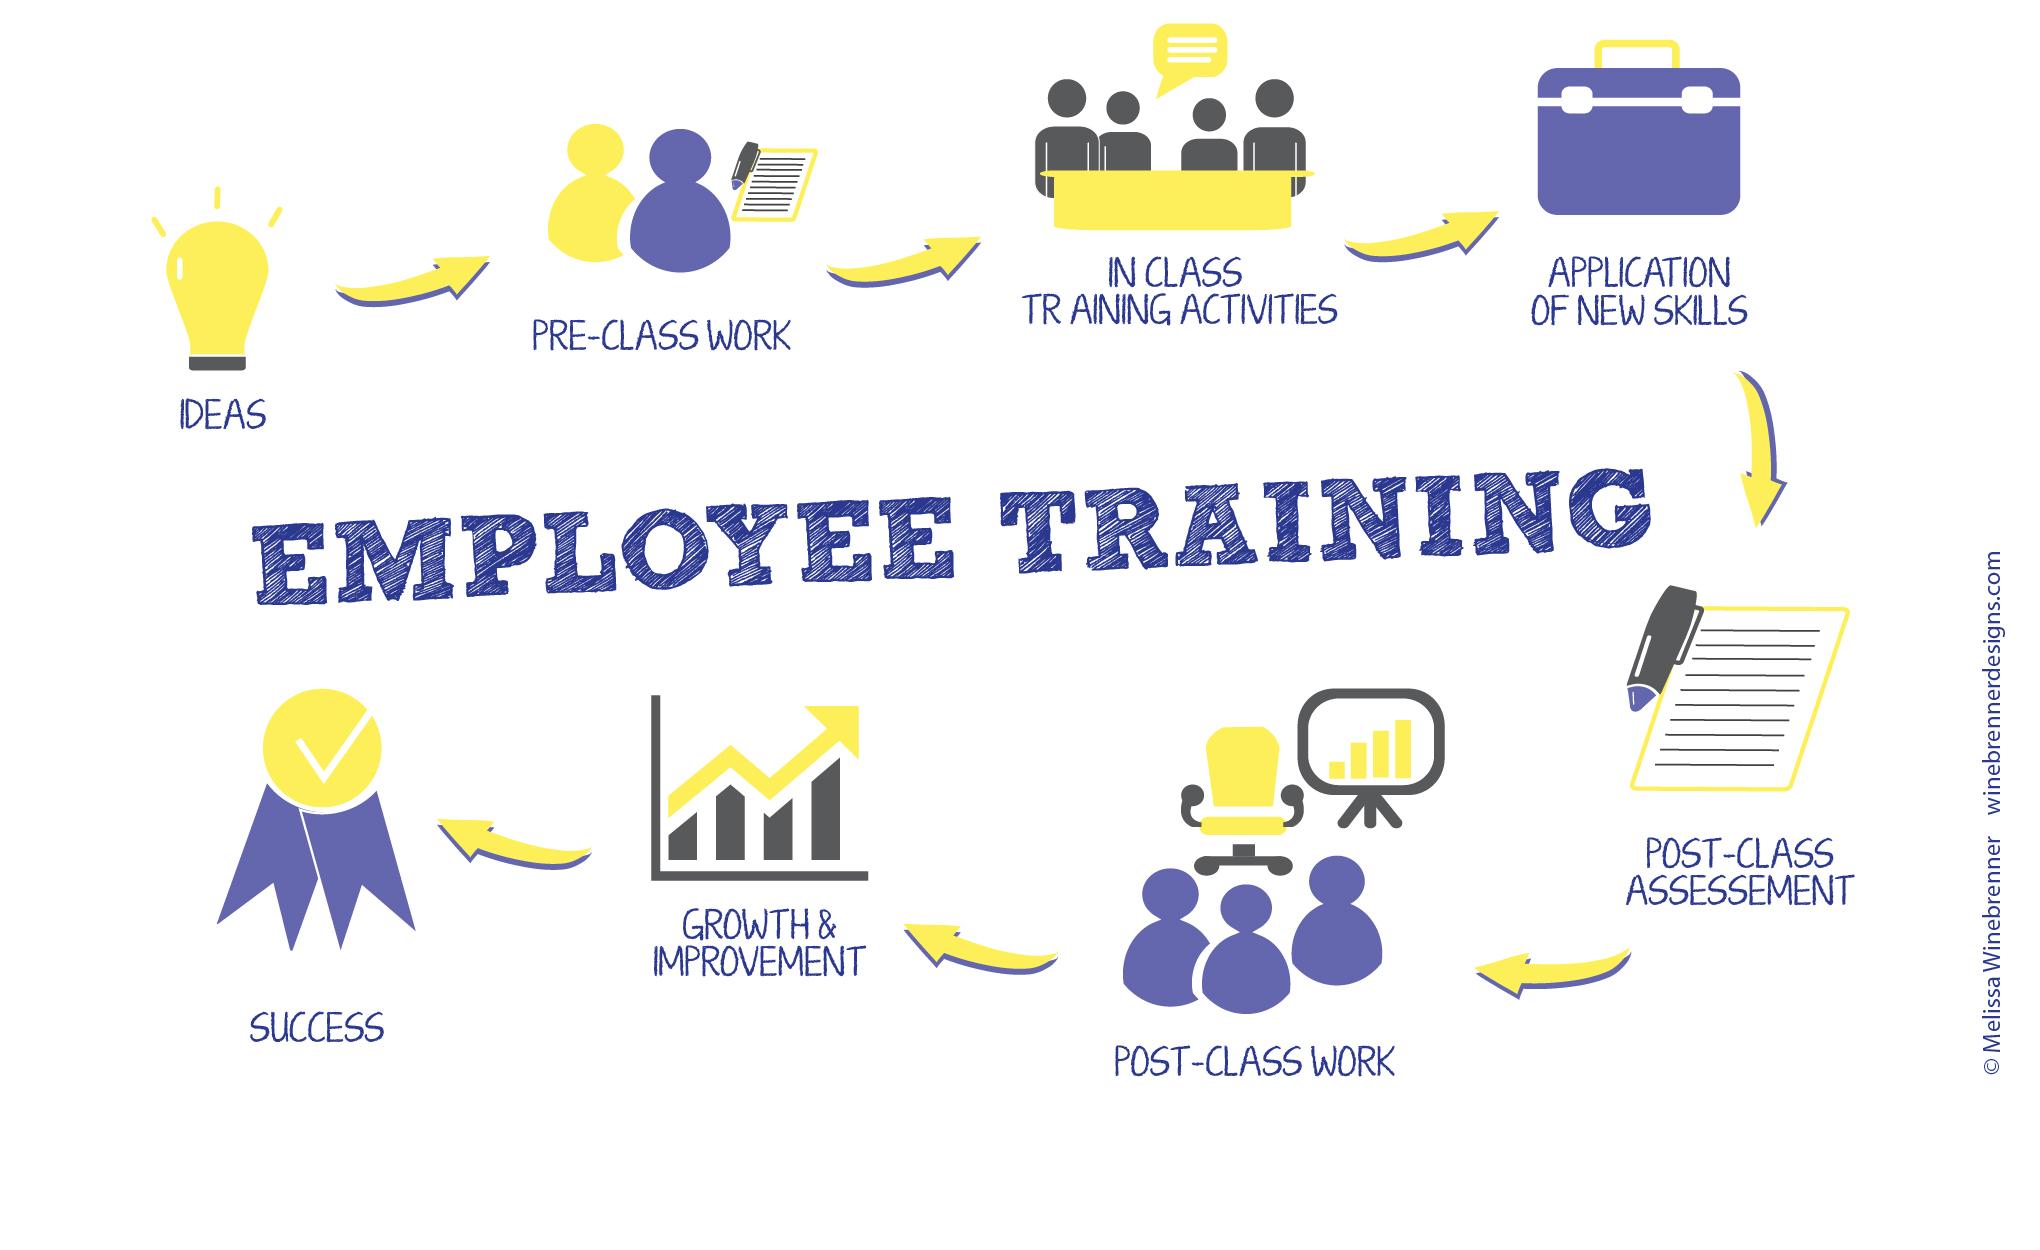 Customized Learning | ME3 Training & Development | Employee